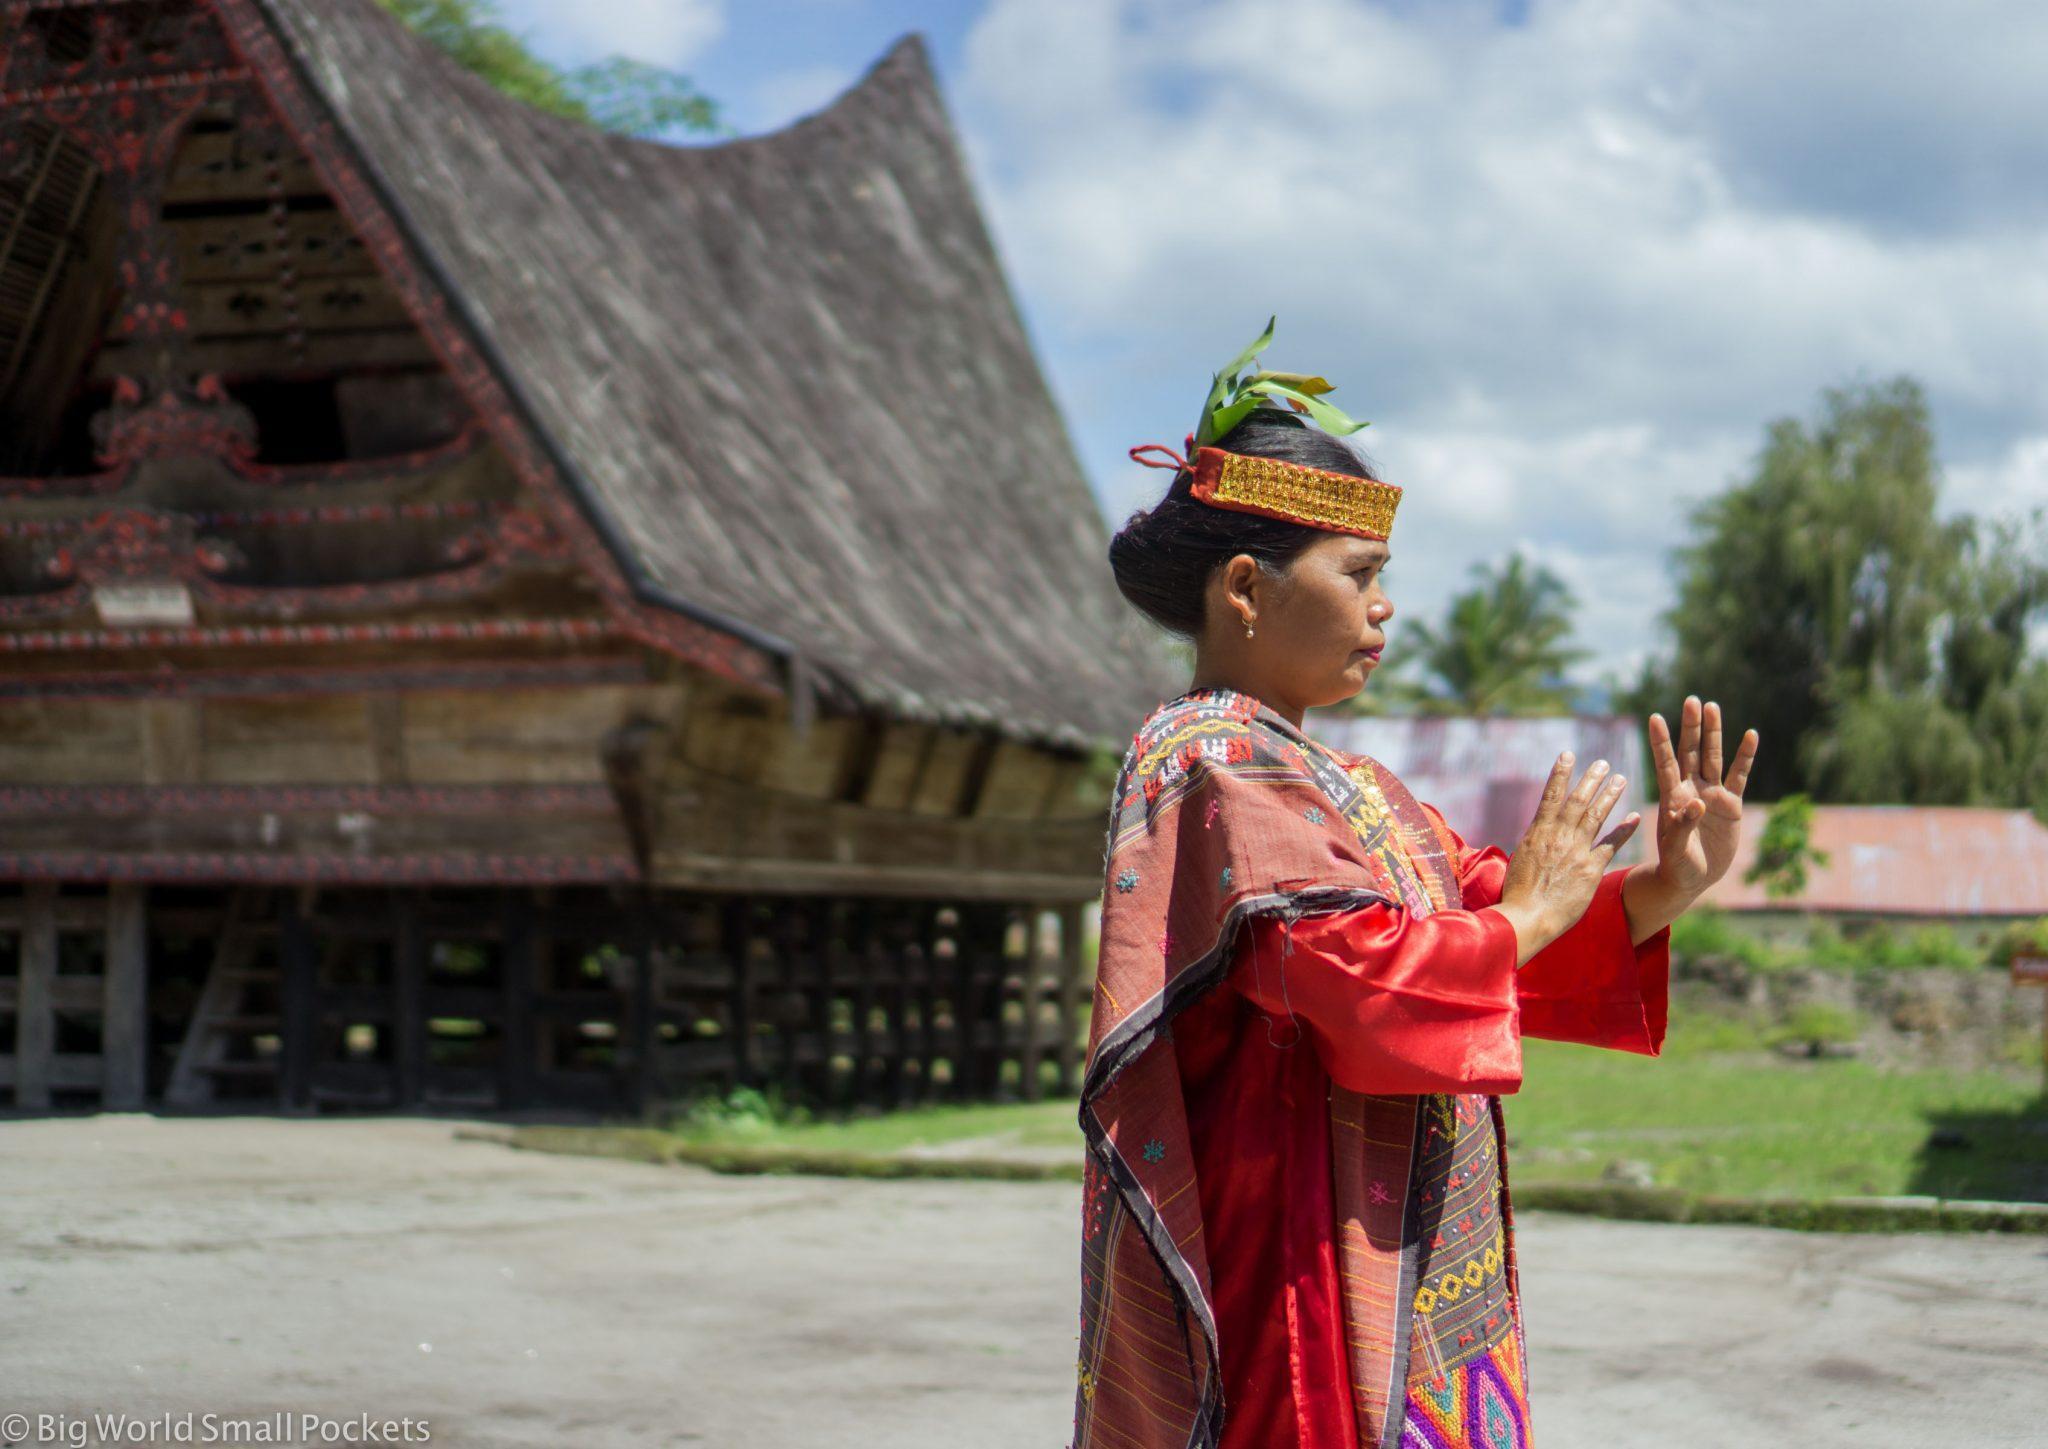 Indonesia, Lake Toba, Traditional Dancer